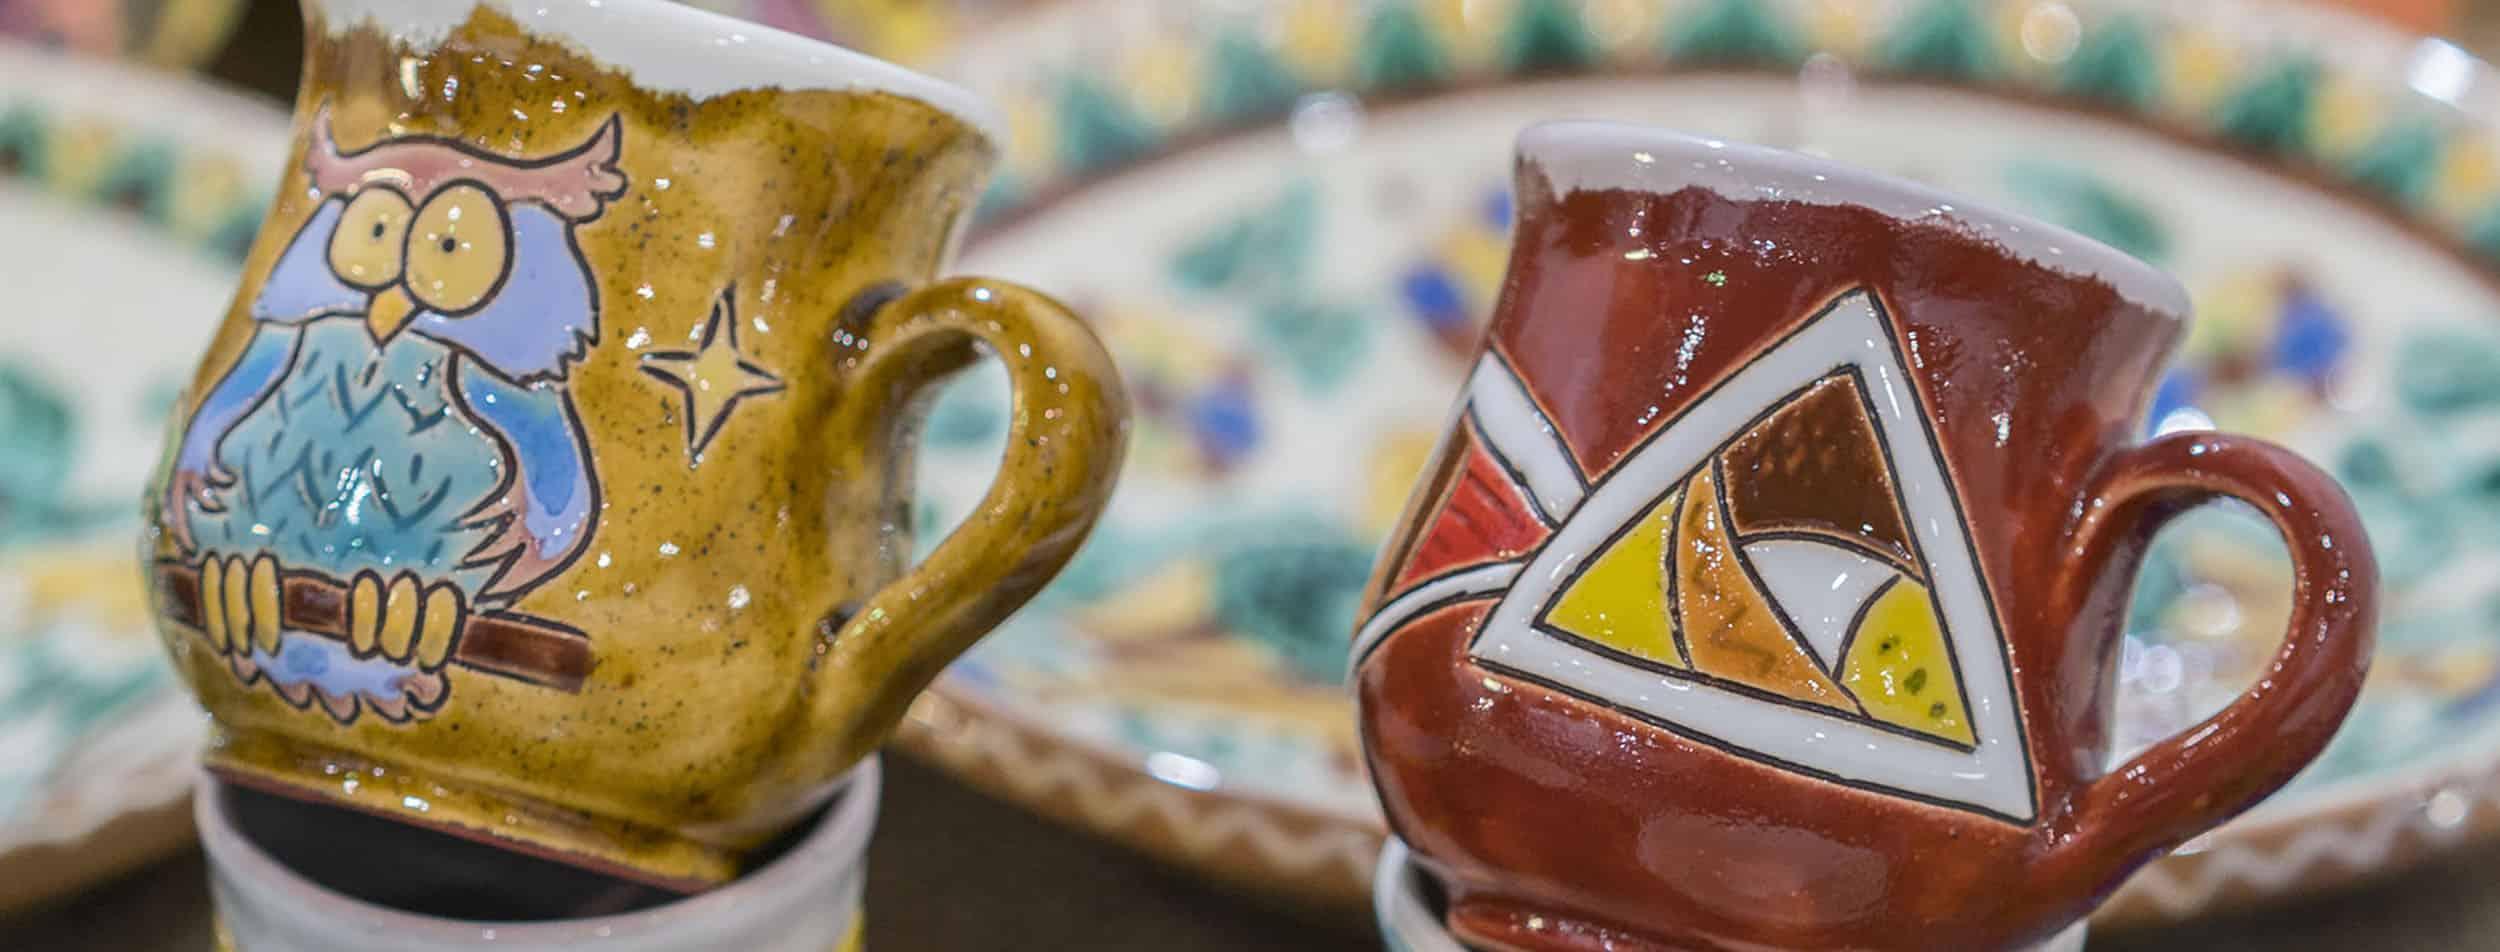 work of art pottery kelowna workshops